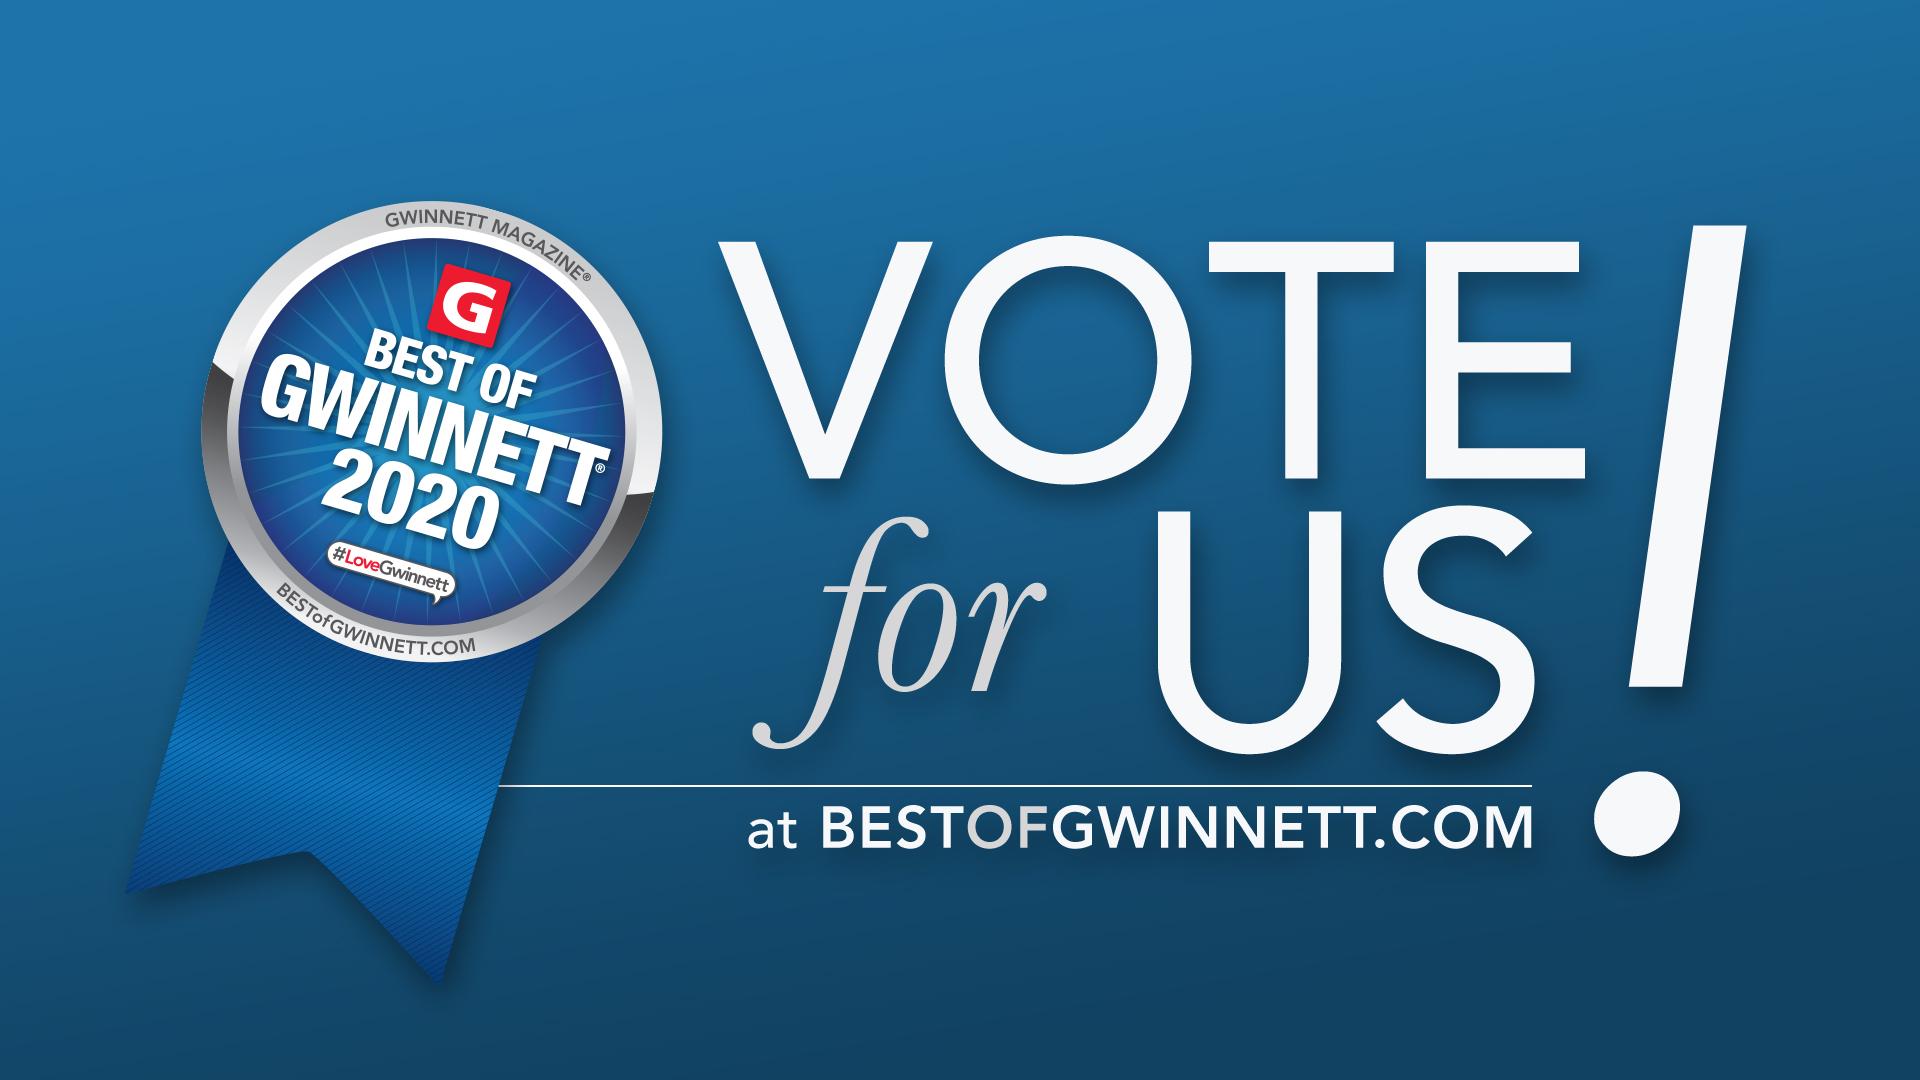 2020 Best of Gwinnett Campaign Kit Facebook